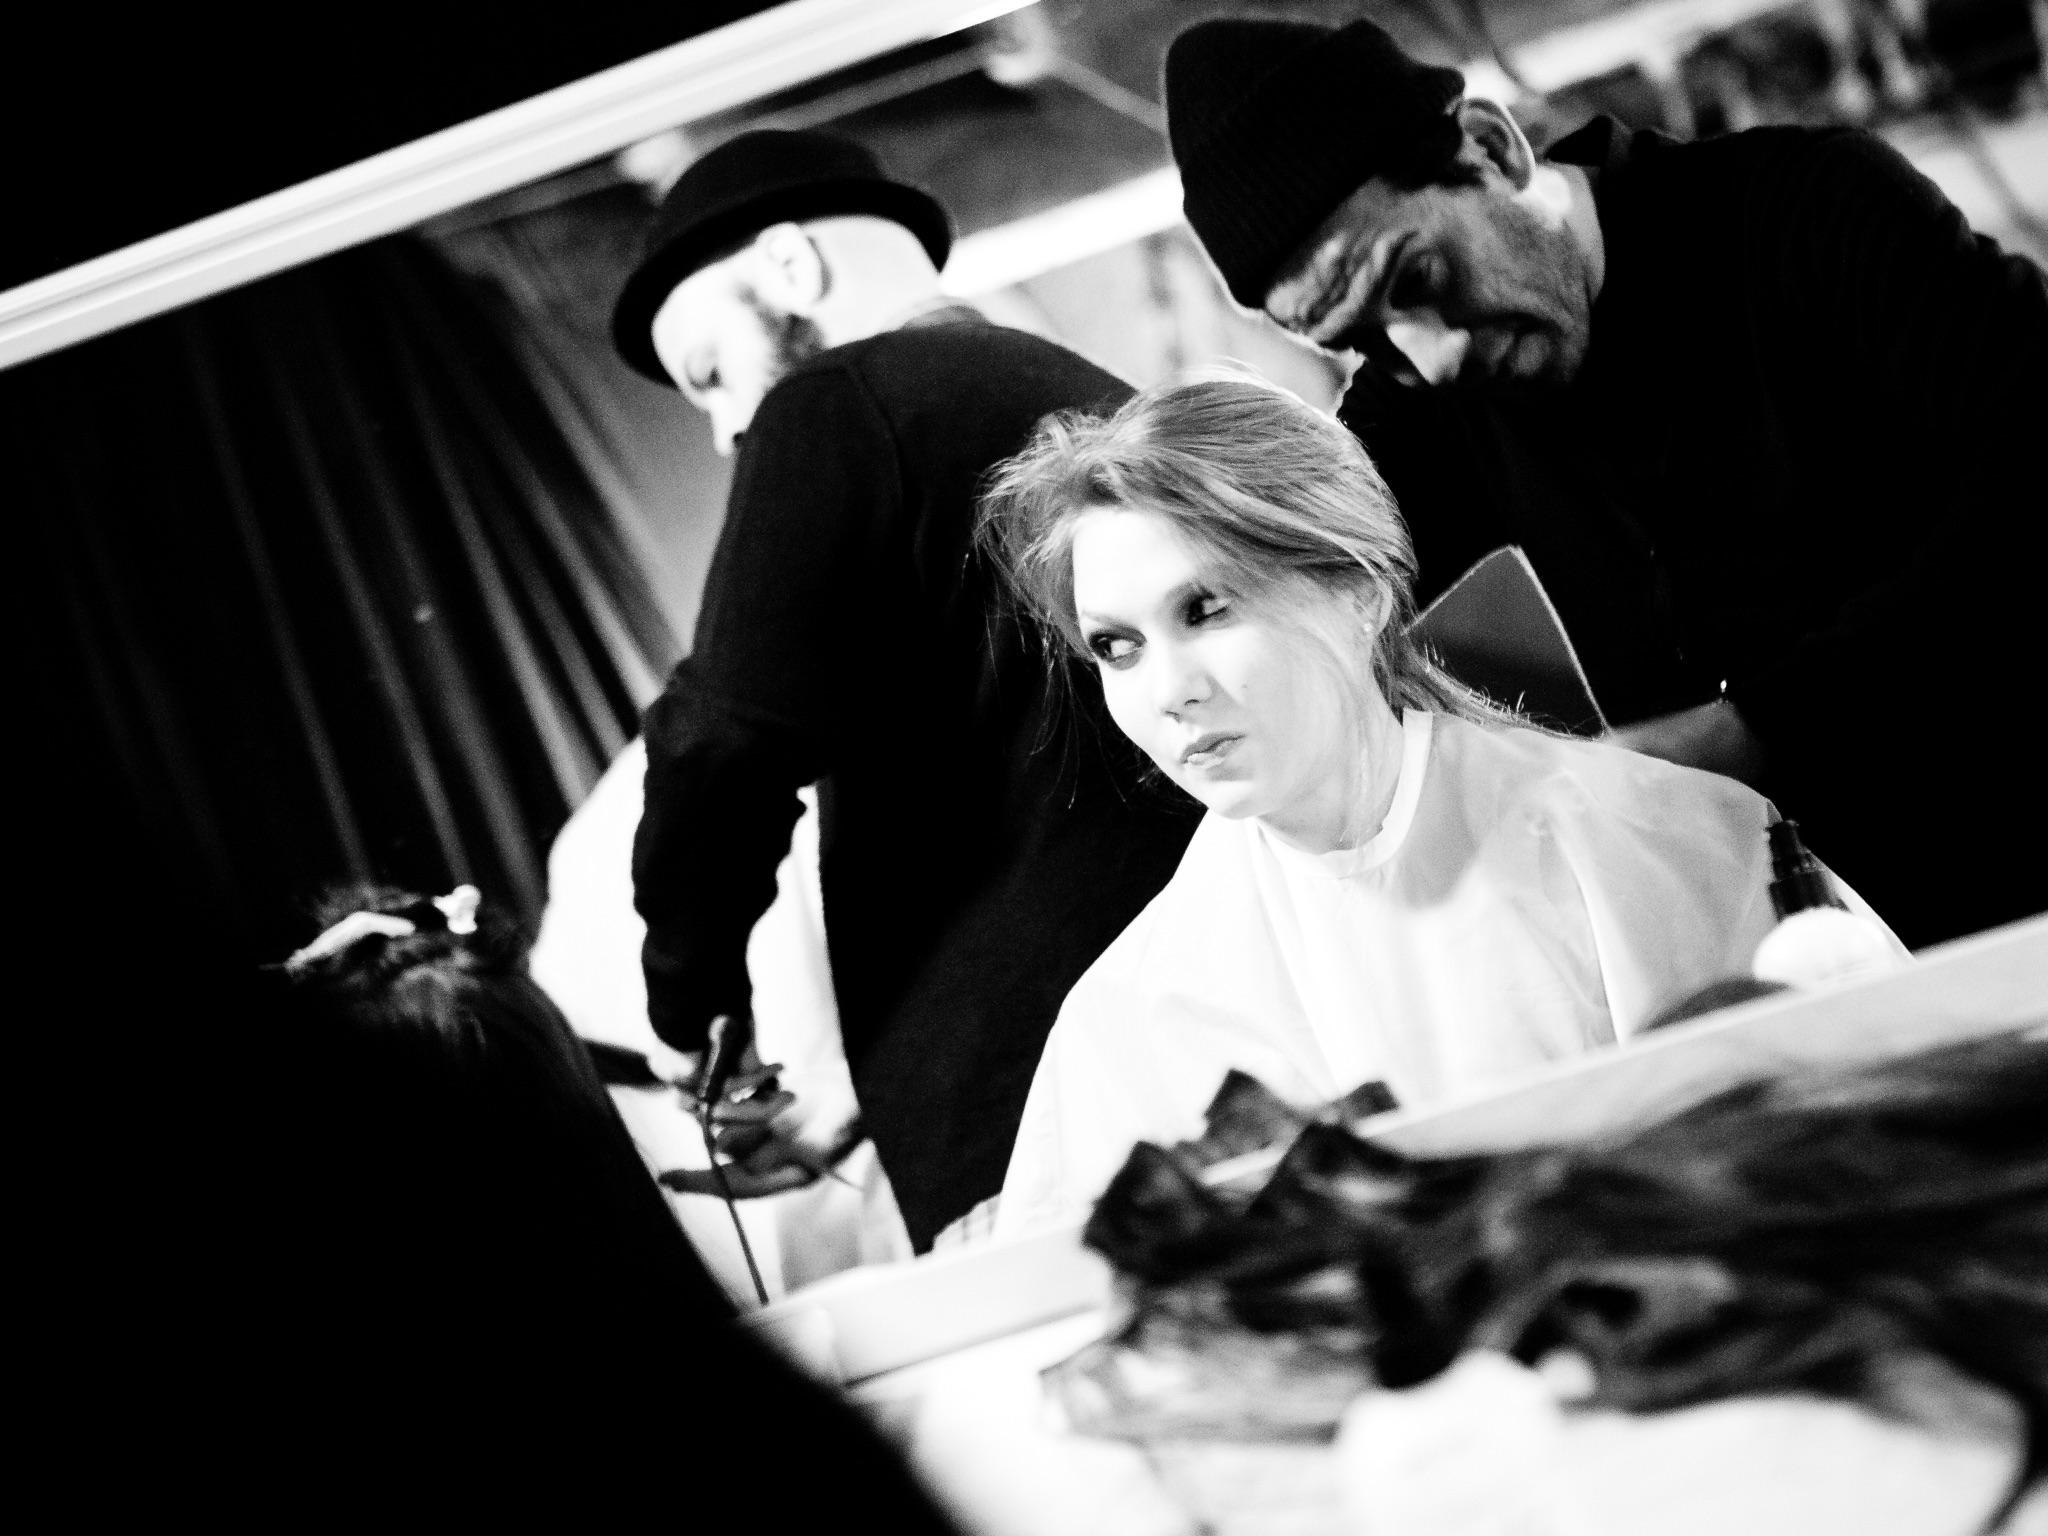 London Fashion Week LFW Runway Show Photography Photograph How to Model Walking Catwalk Youtube Video Guide Tutorial Backstage Karlie Kloss Zac Posen PFW Paris